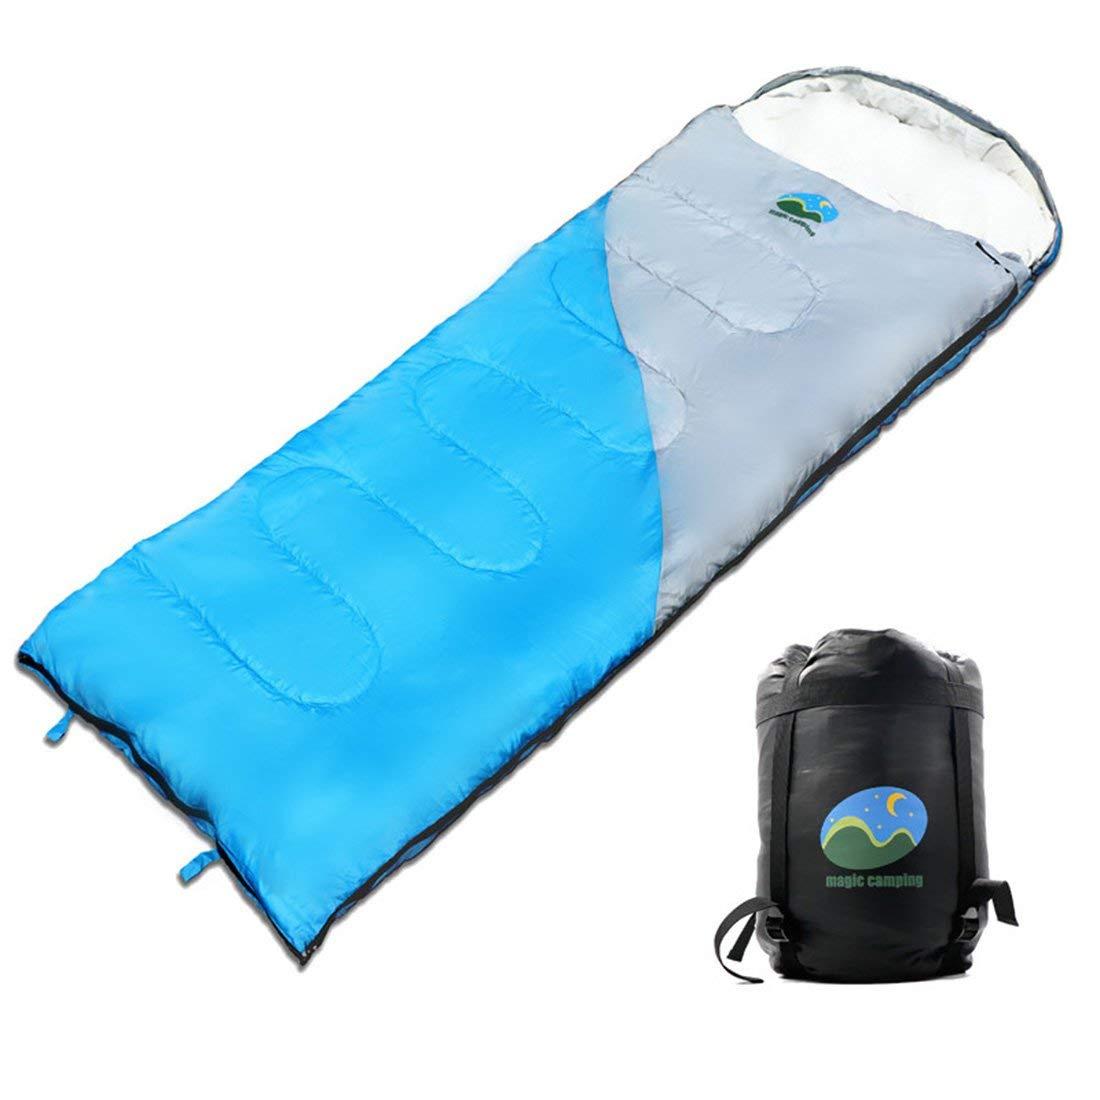 3 Estaciones Sacos de Dormir Rectangulares Impermeable con Bolsa de Compresi/ón Port/átil MAIKEHIGH Saco de Dormir Invierno para Acampar 1.6kg 10~5℃ para Viajes Camping Senderismo 220x75cm